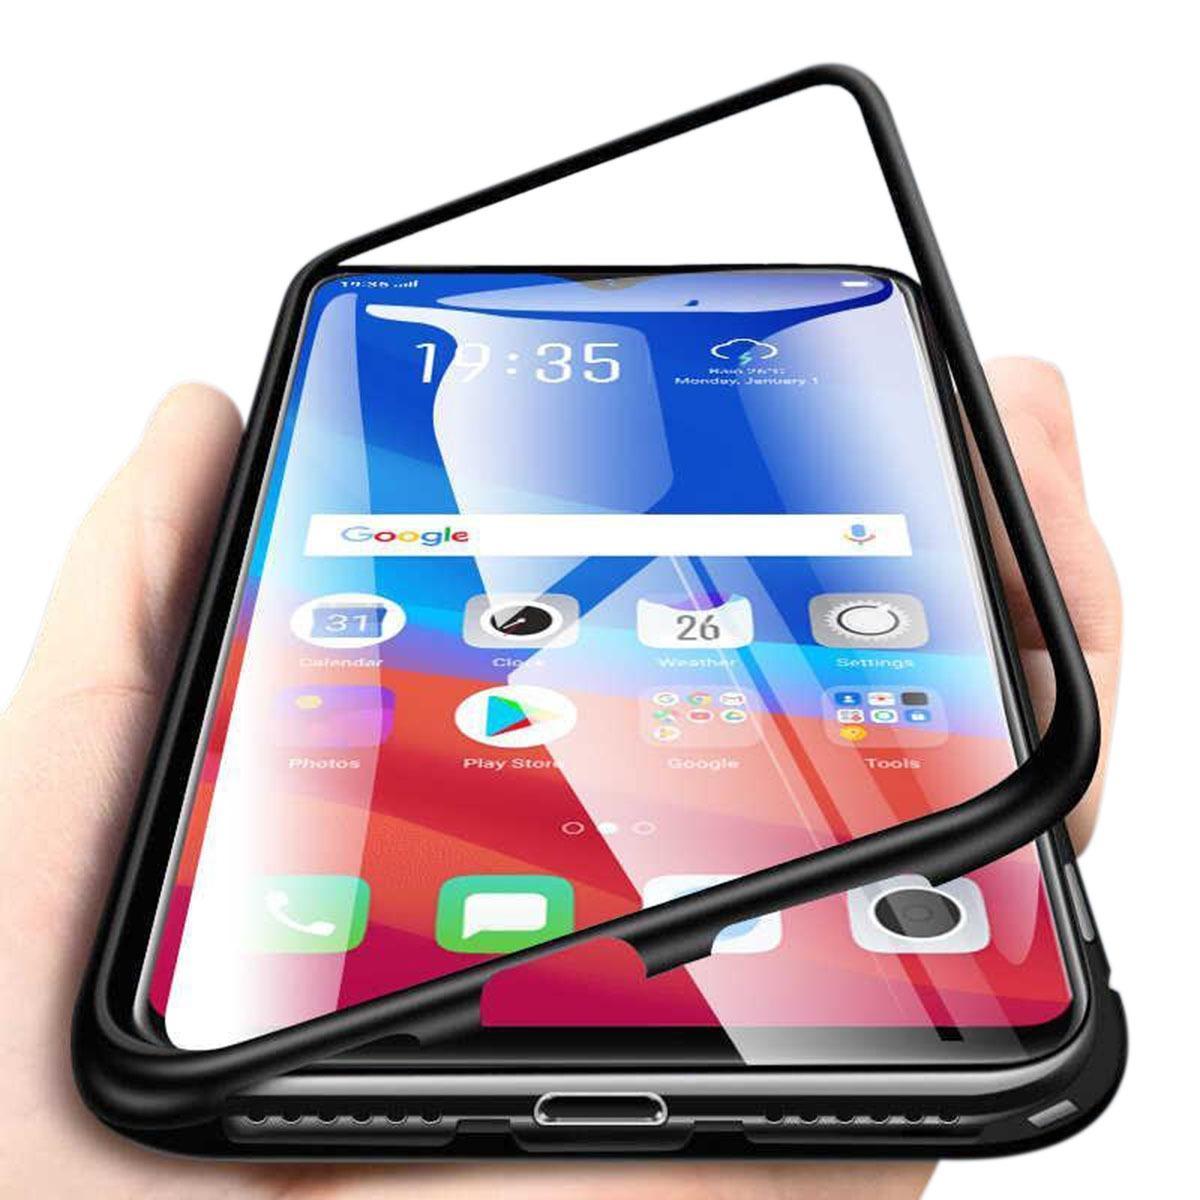 2441986379 Mobile Phone Covers In Bangladesh At Best Price - Daraz.com.bd